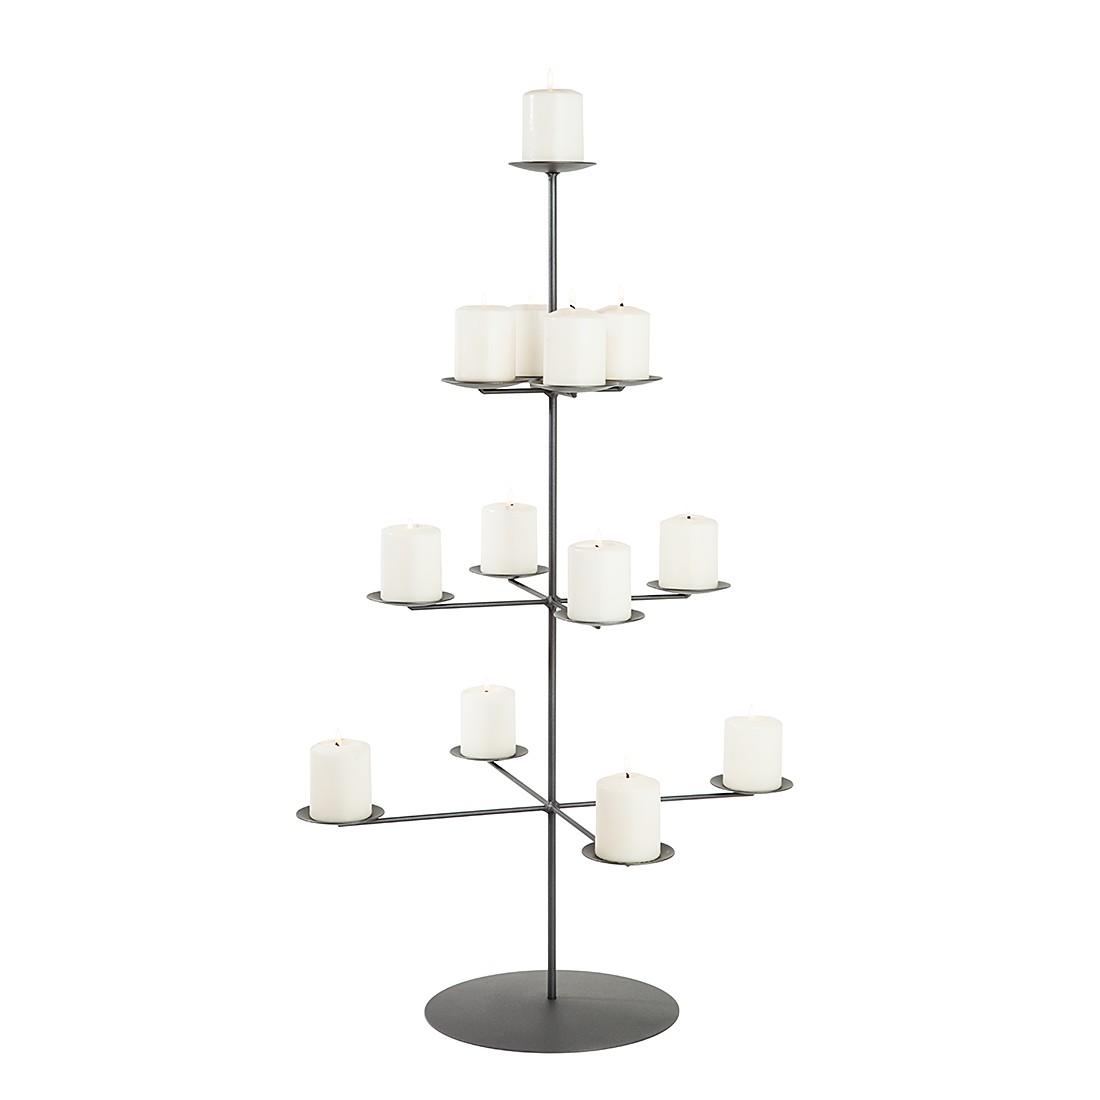 Lilja Metall-Kerzenständer, Home24Deko günstig online kaufen